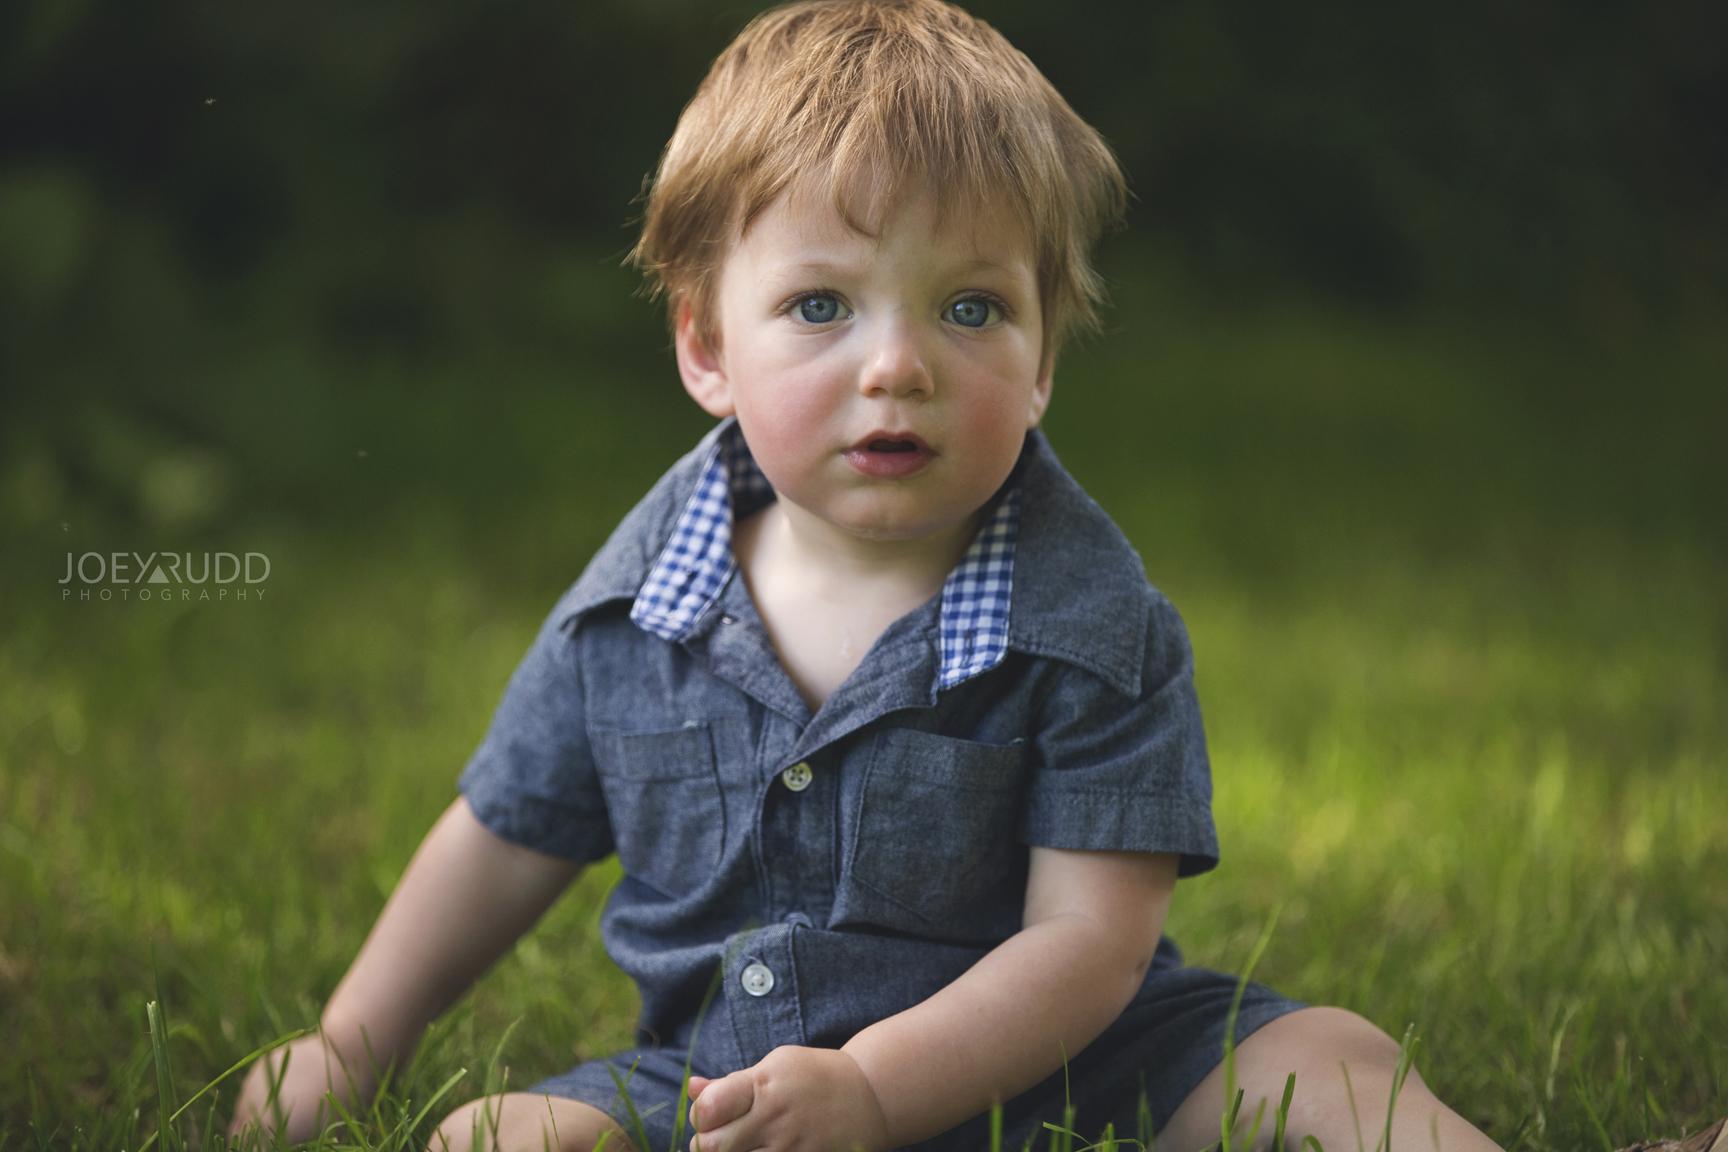 Ottawa Family Photographer Joey Rudd Photography Arboretum Child